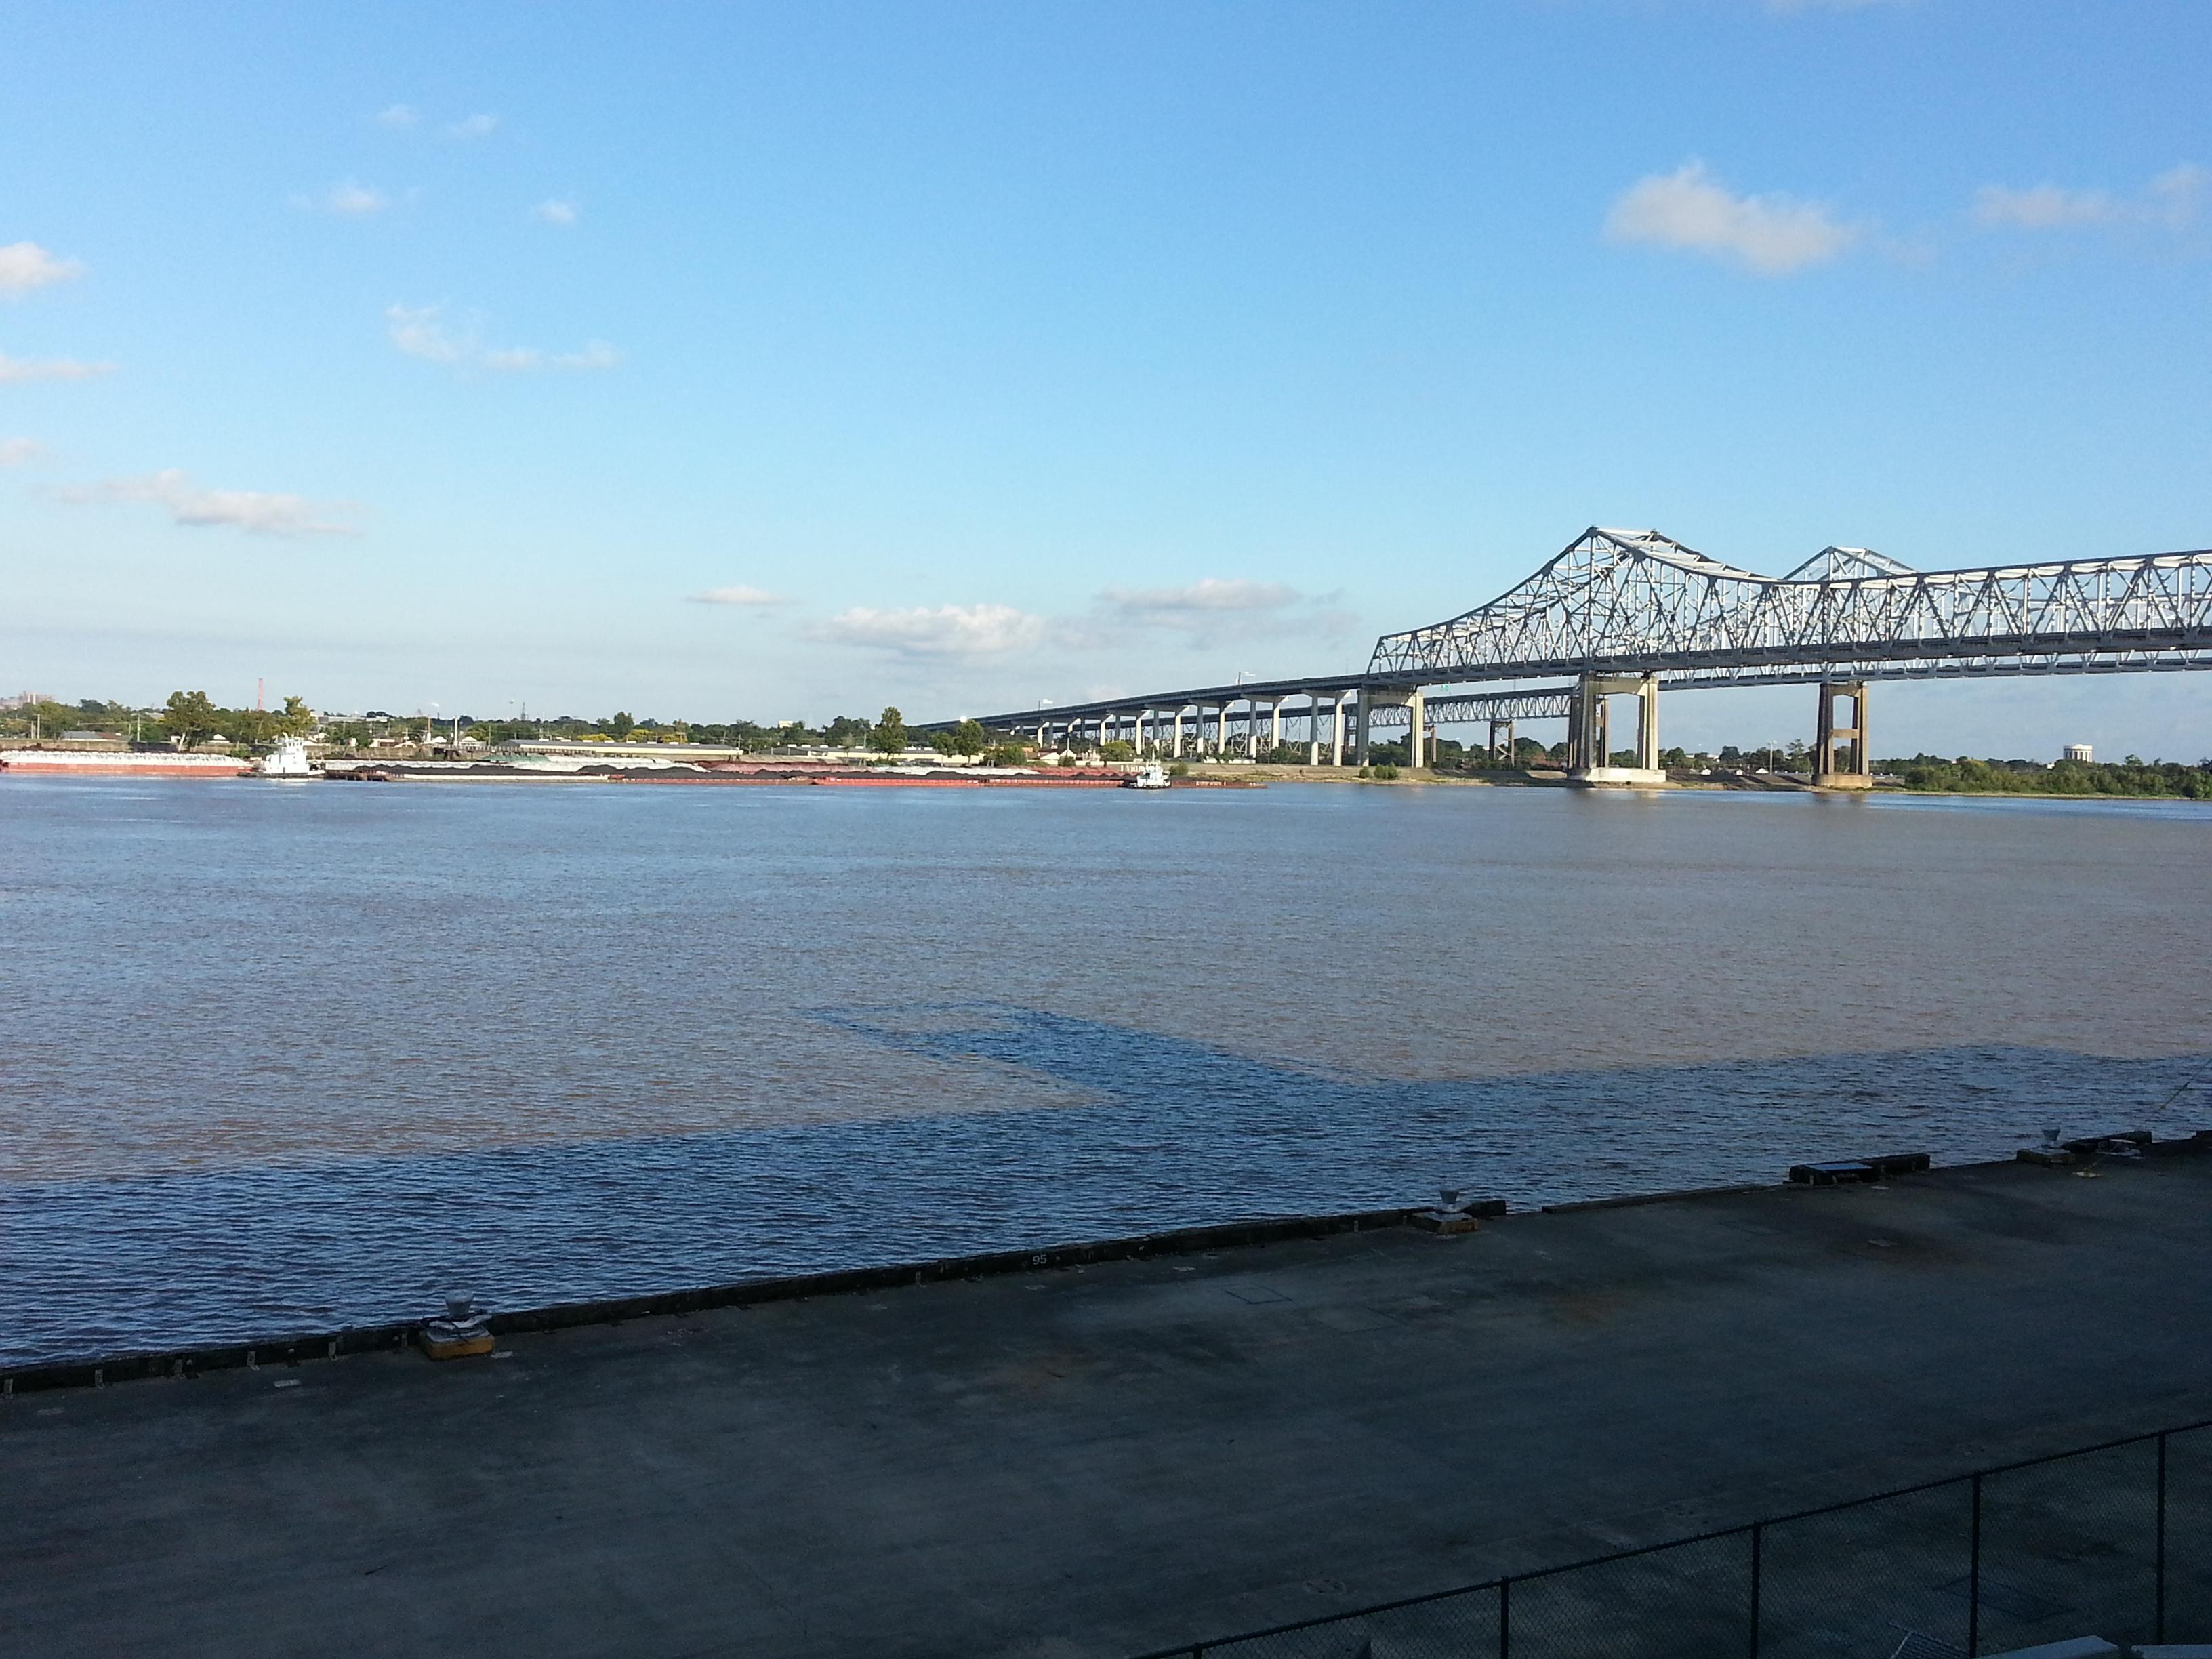 Mississippi River at New Orleans